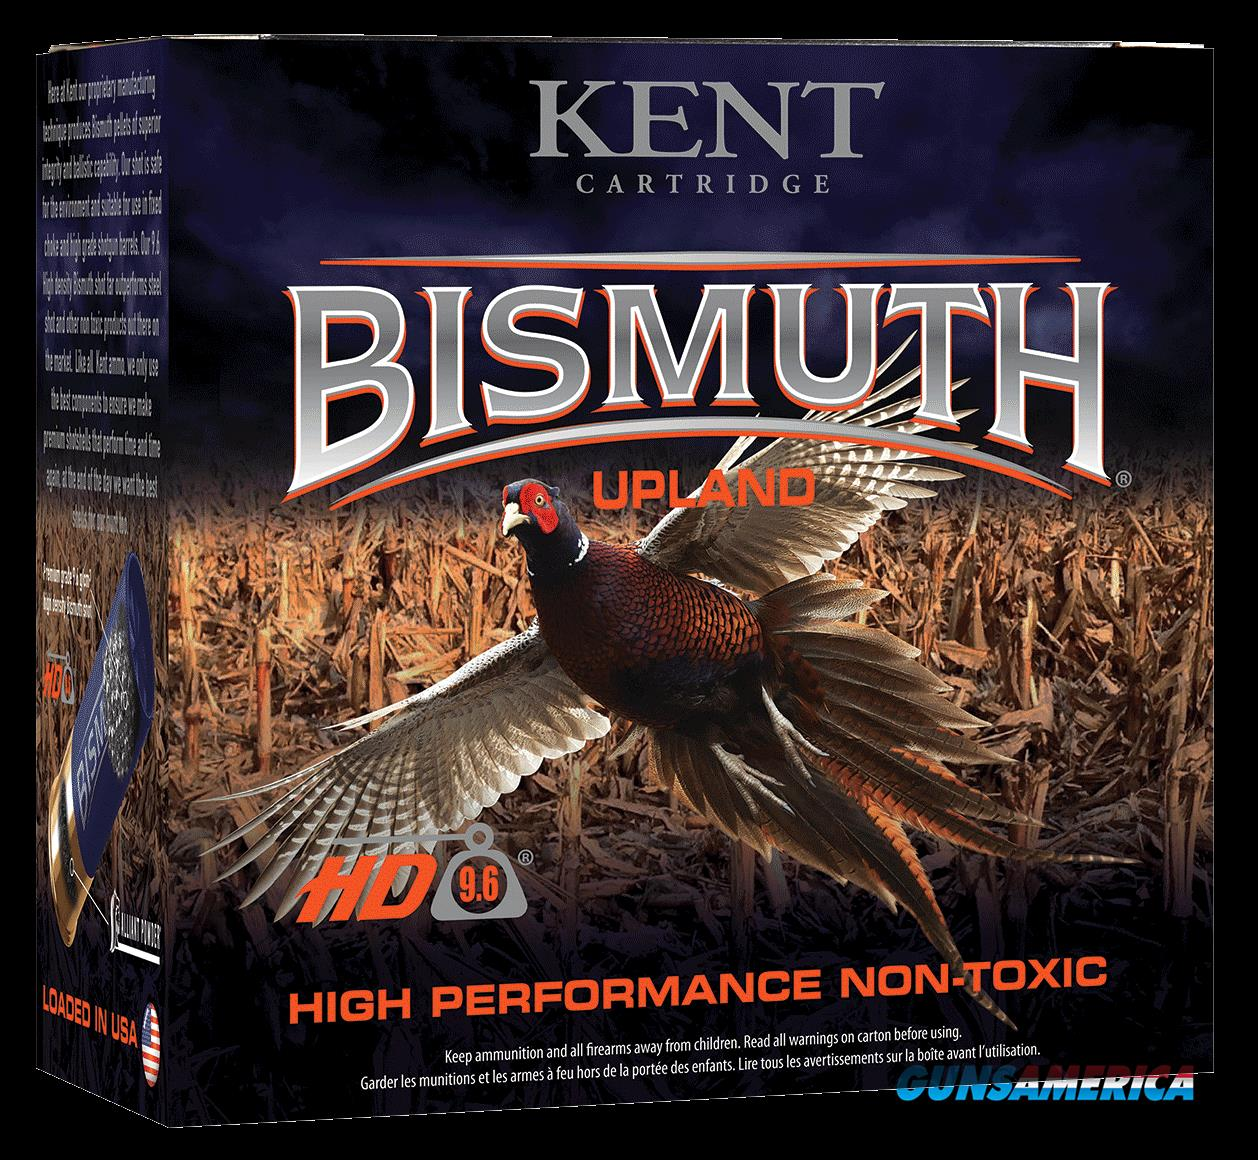 Kent Cartridge Bismuth, Kent B16u285    2.75  1oz  Bismt Upland      25-10  Guns > Pistols > 1911 Pistol Copies (non-Colt)